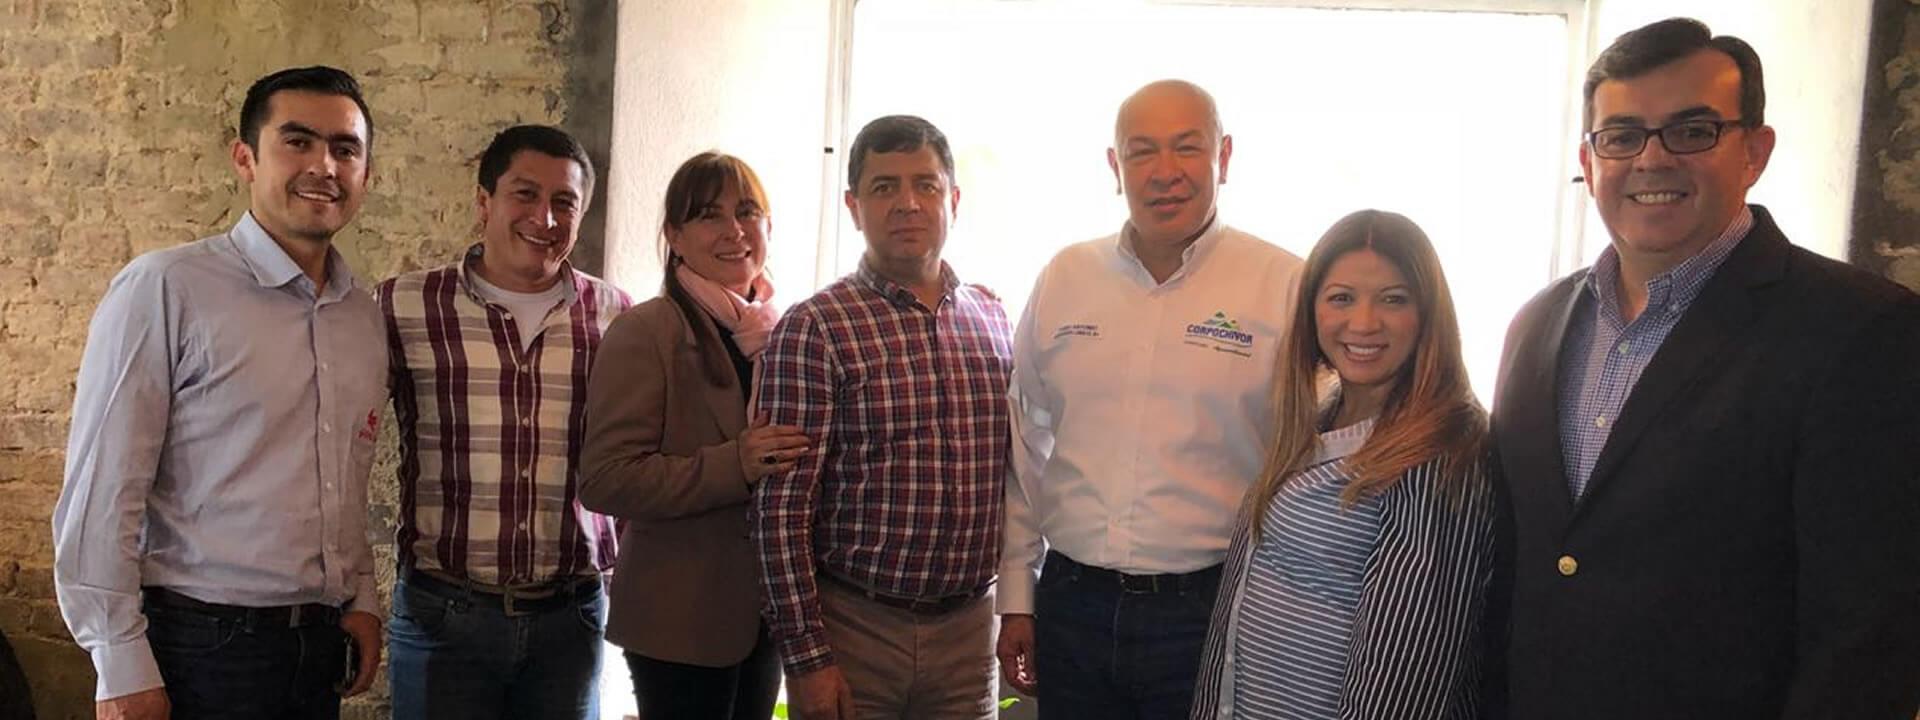 https://www.porkcolombia.co/wp-content/uploads/2018/06/home_s1.jpg